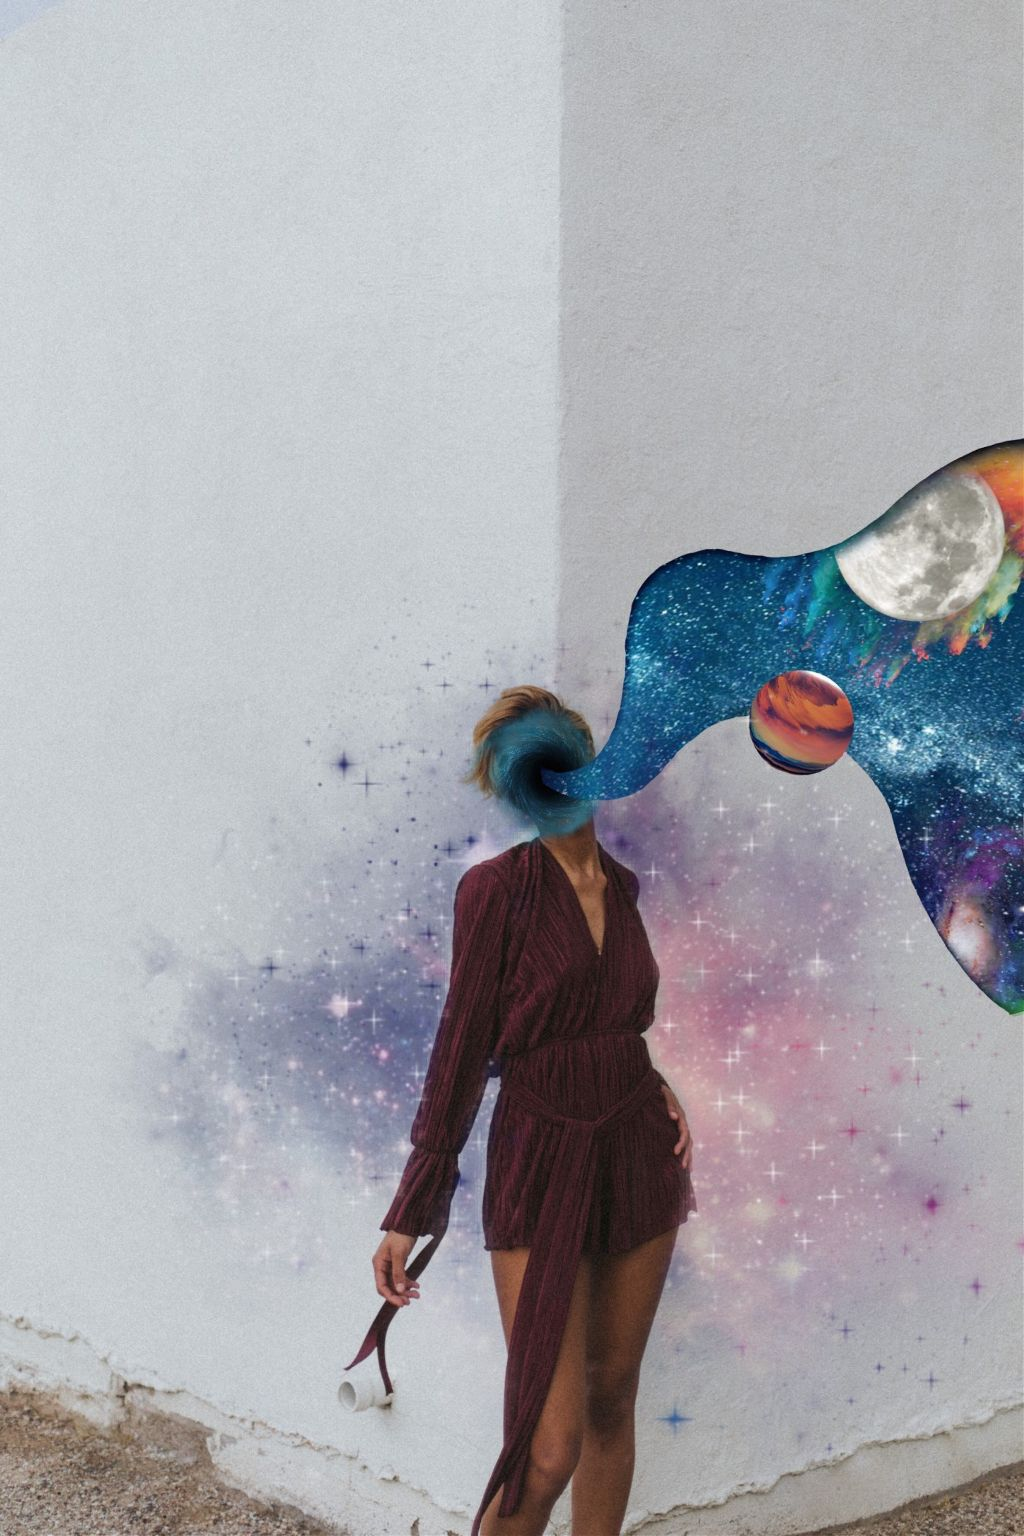 #космос #galaxy #planet #model #myteacher #irclightbulb #metgala #metgala #stories #mothersdaybrush #hazemagiceffect #dchands #idontfeelsogood #travel #hands #dispersion